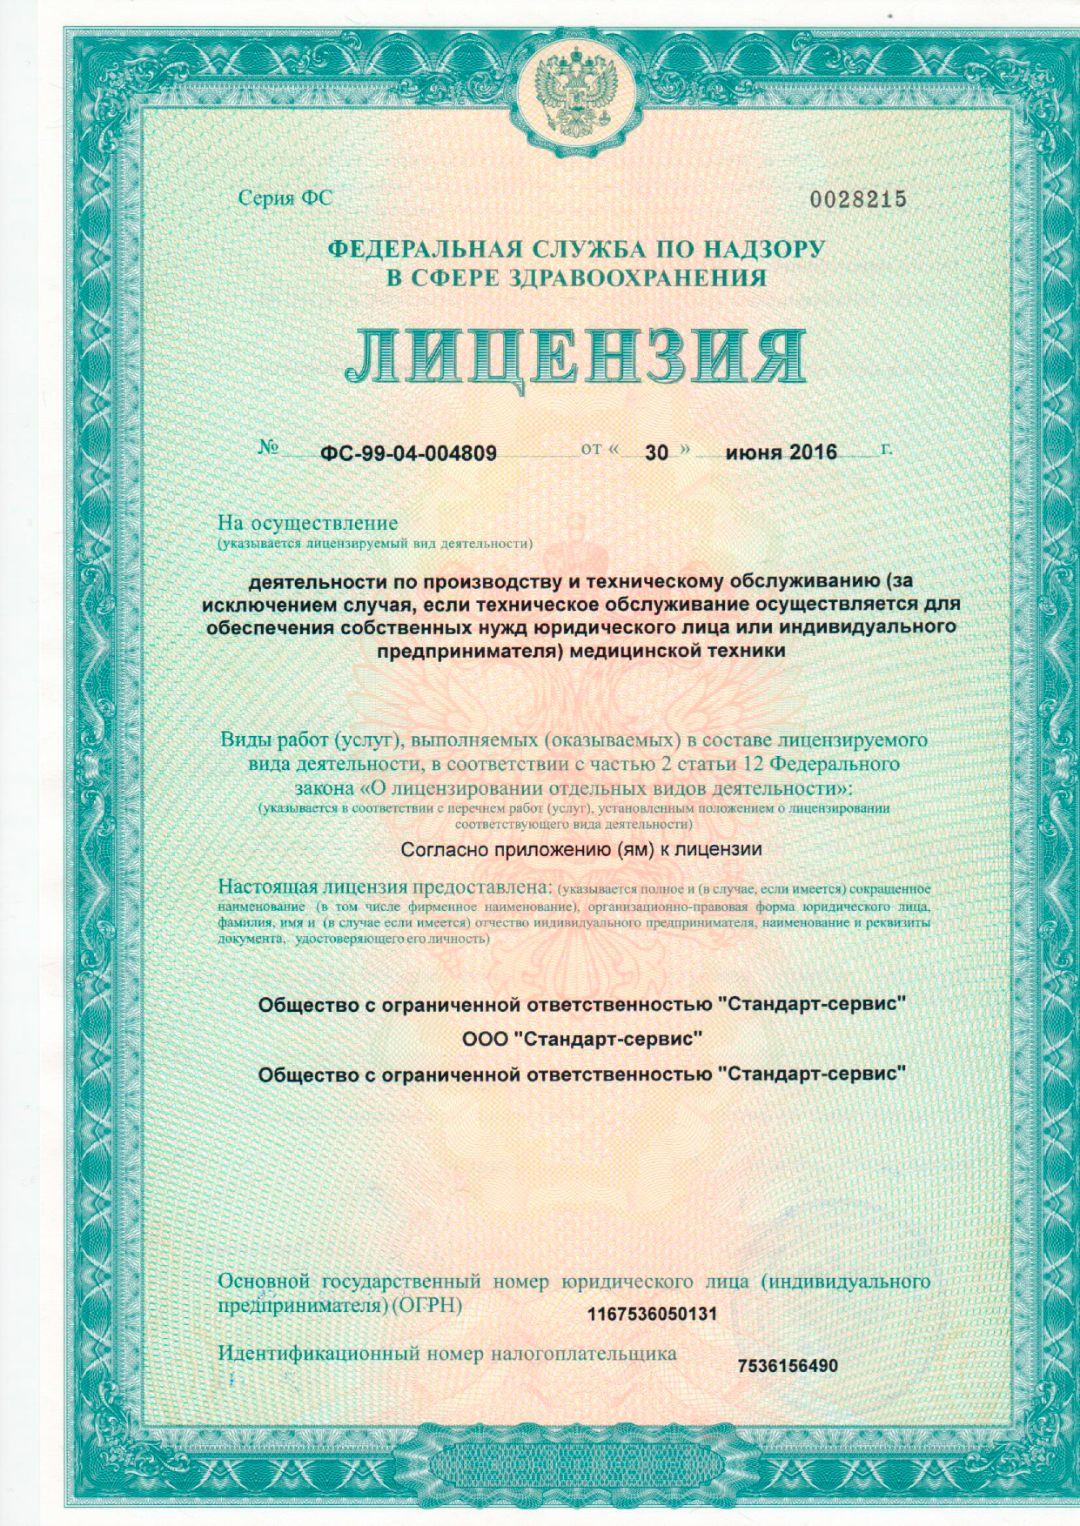 Лицензия на обслуживание медицинской техники 1 стр.